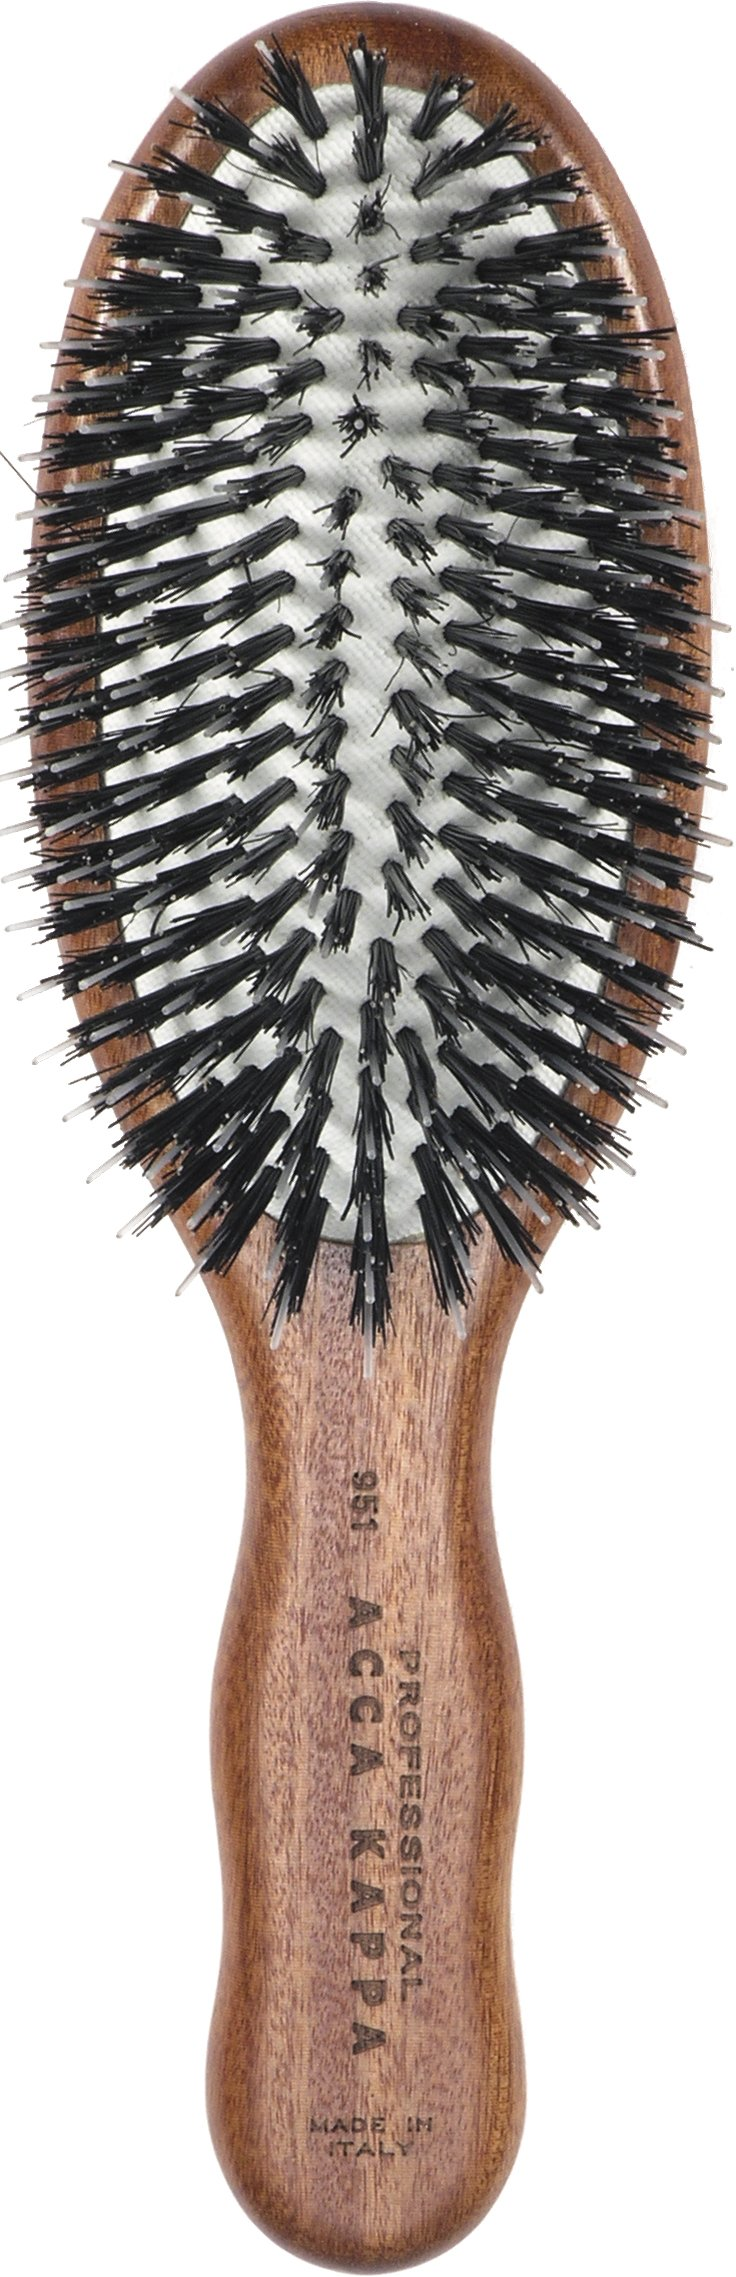 Acca Kappa Professional Pro Pneumatic Hair Brush, Purse, Boar/Nylon